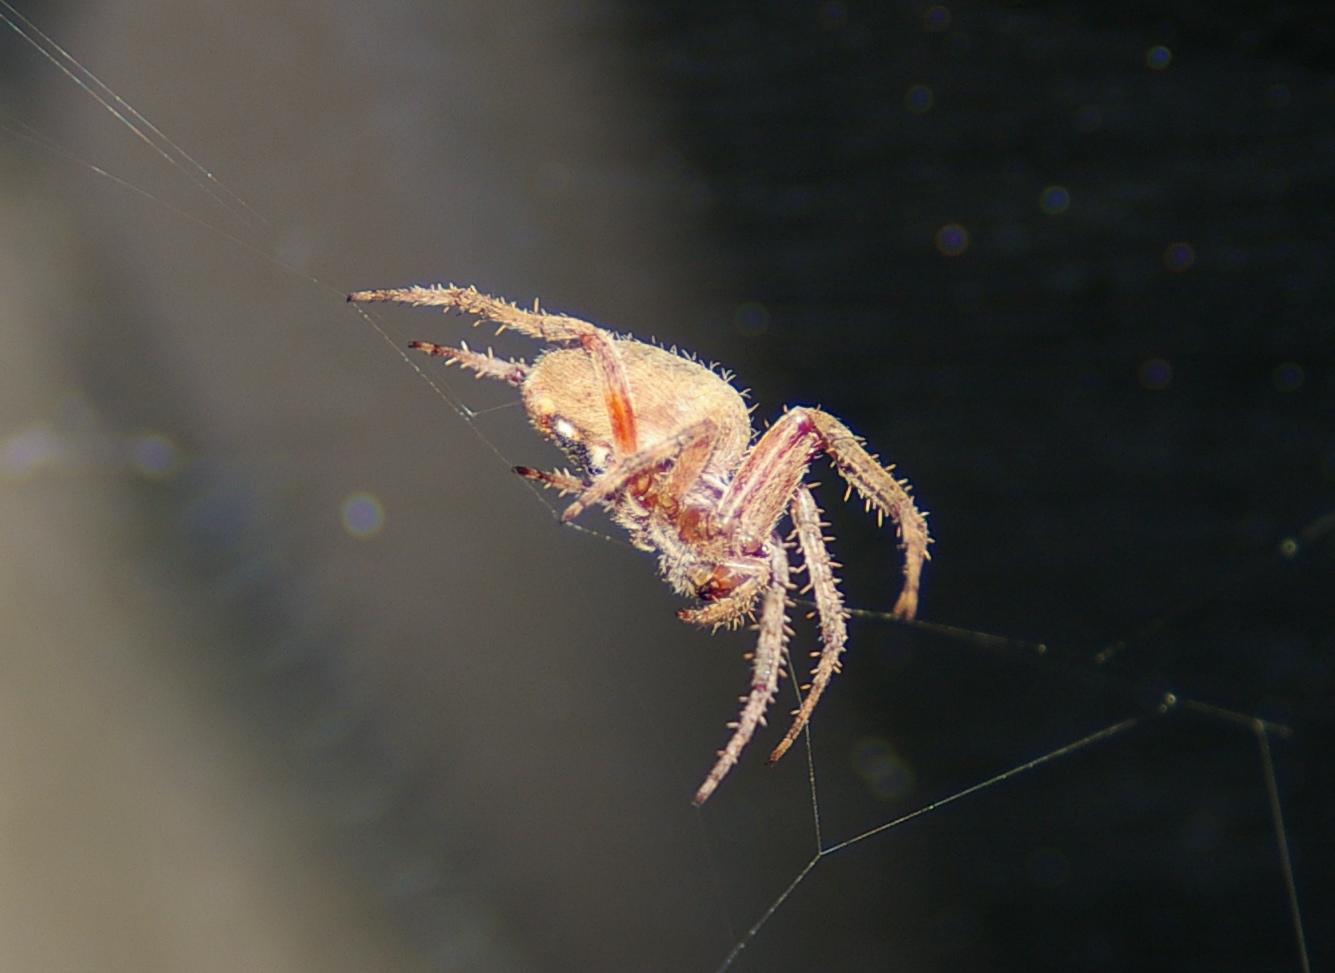 an peach-colored orb-weaver spider balanced on a few silken threads